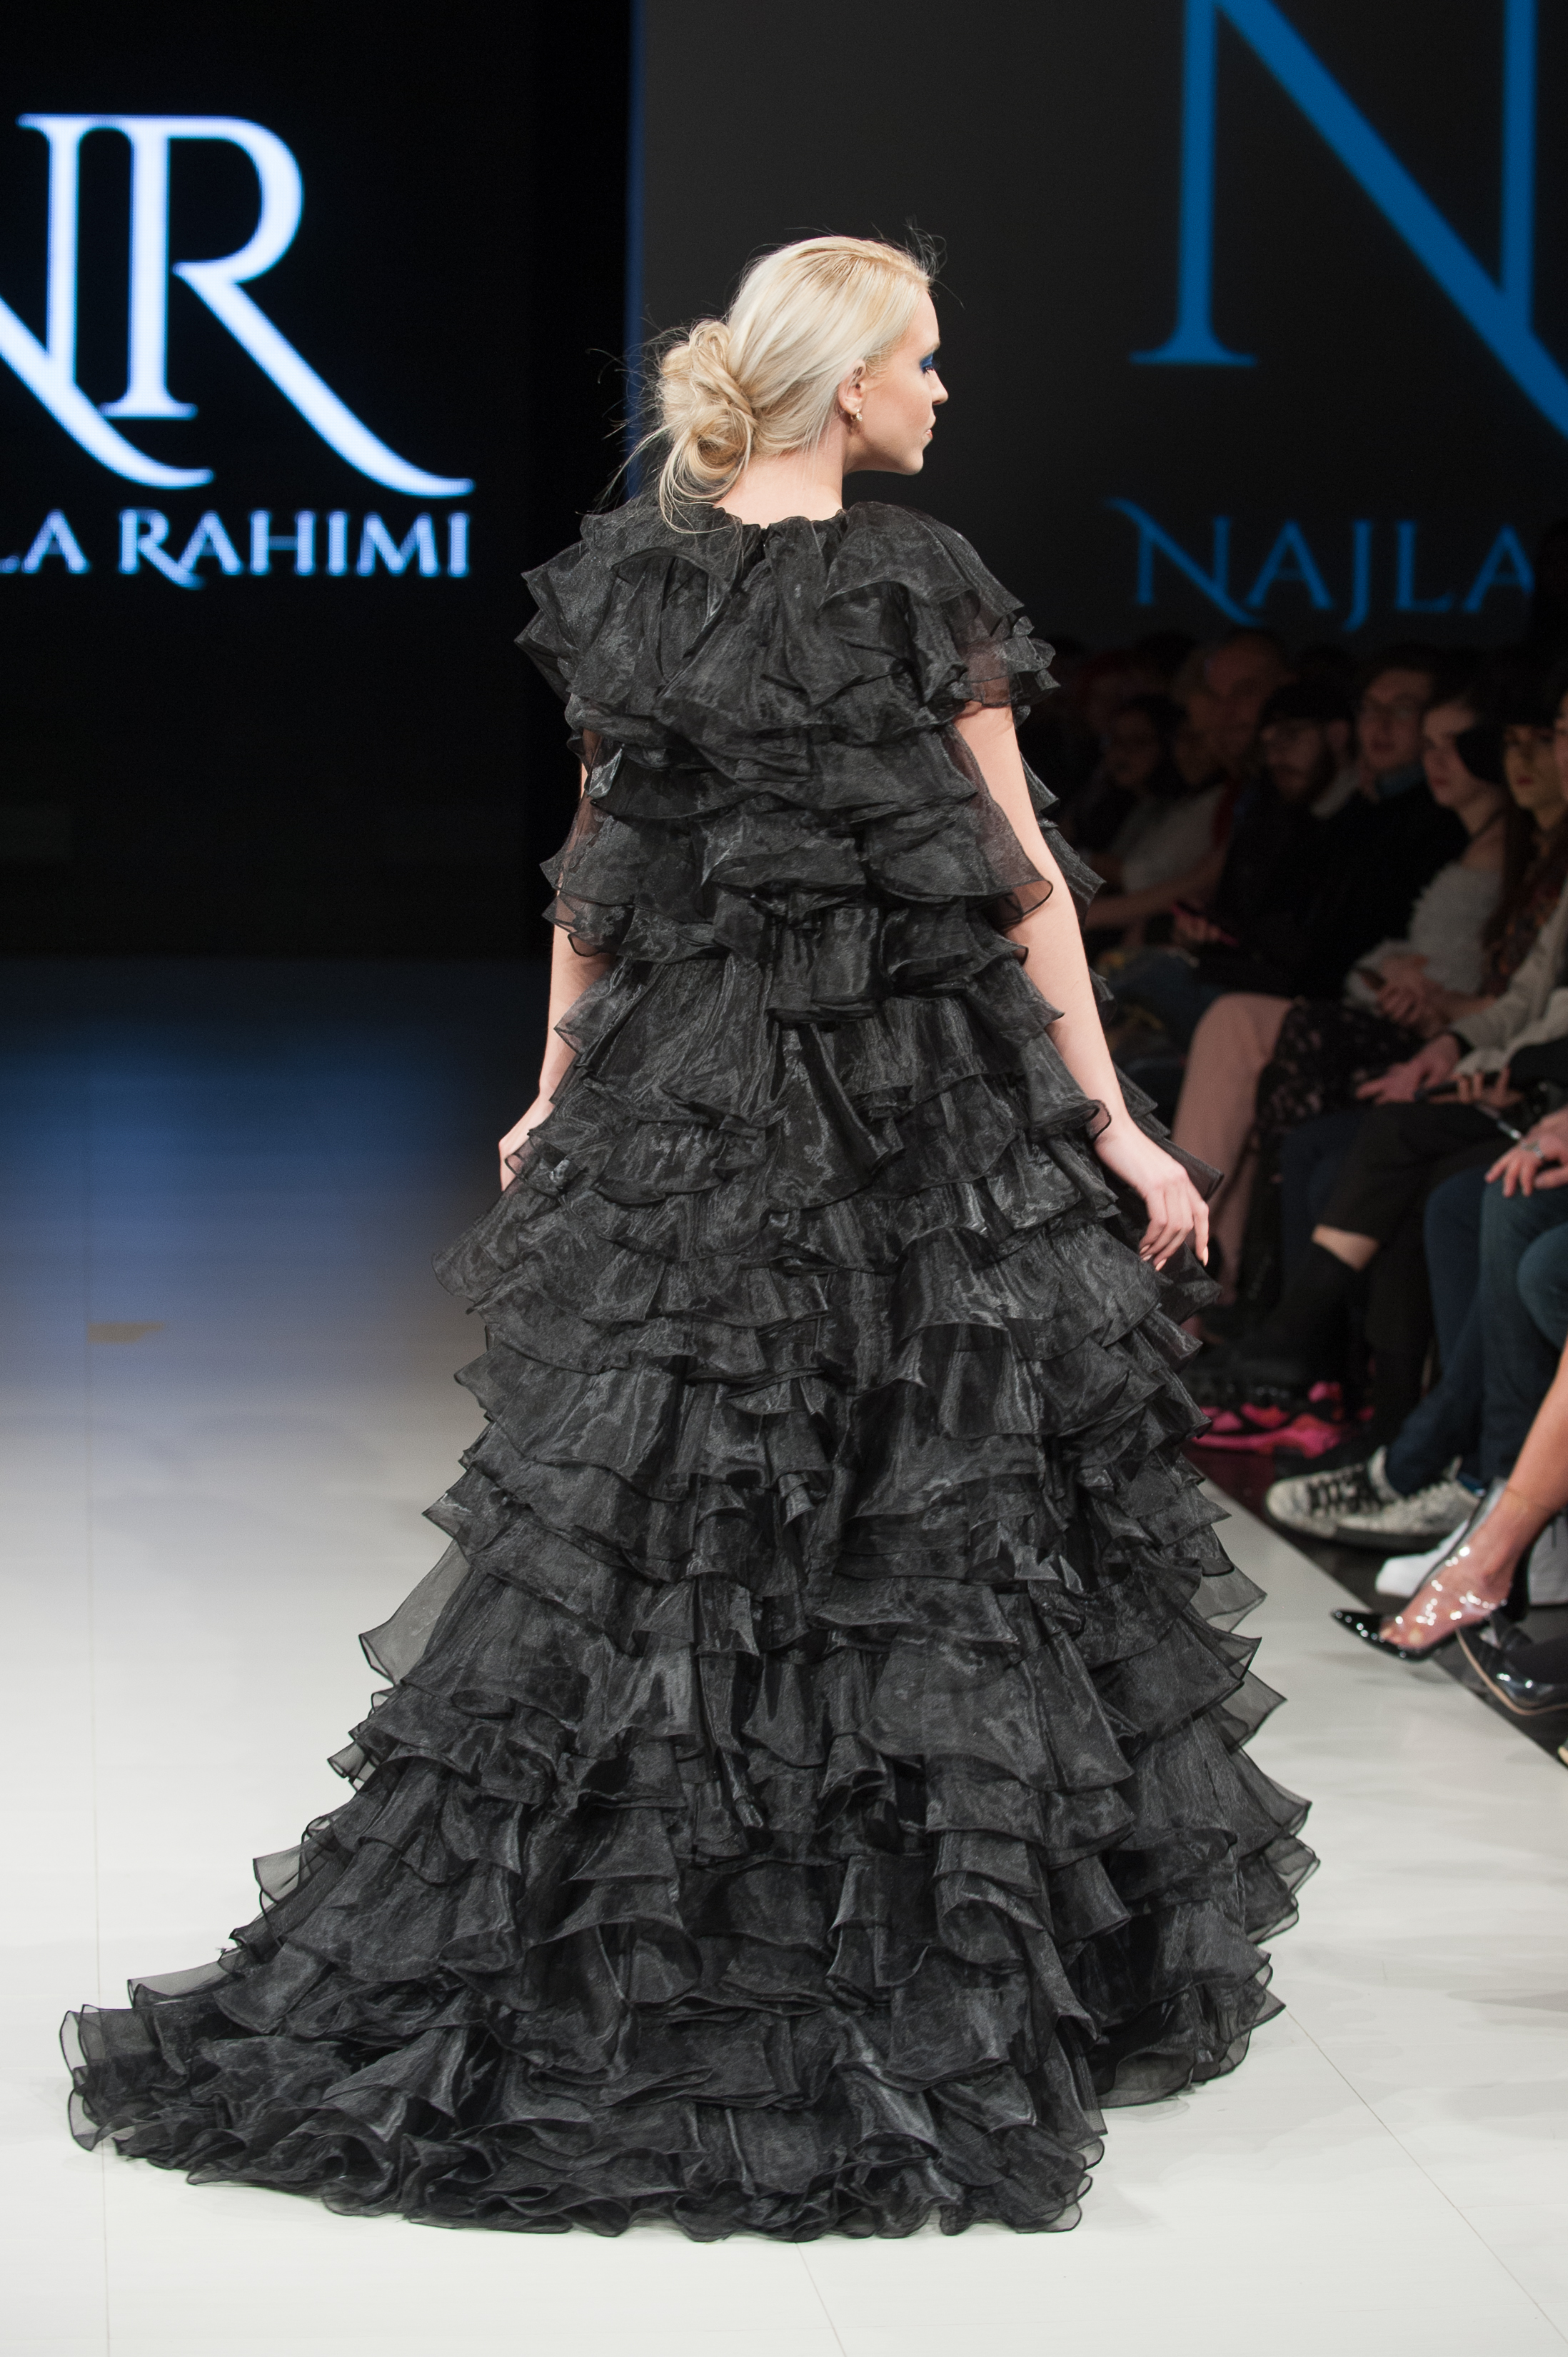 FAT2018-Day1-April17-Najla_Rahimi-Runway-Che_Rosales-LARAWAN-5863.jpg